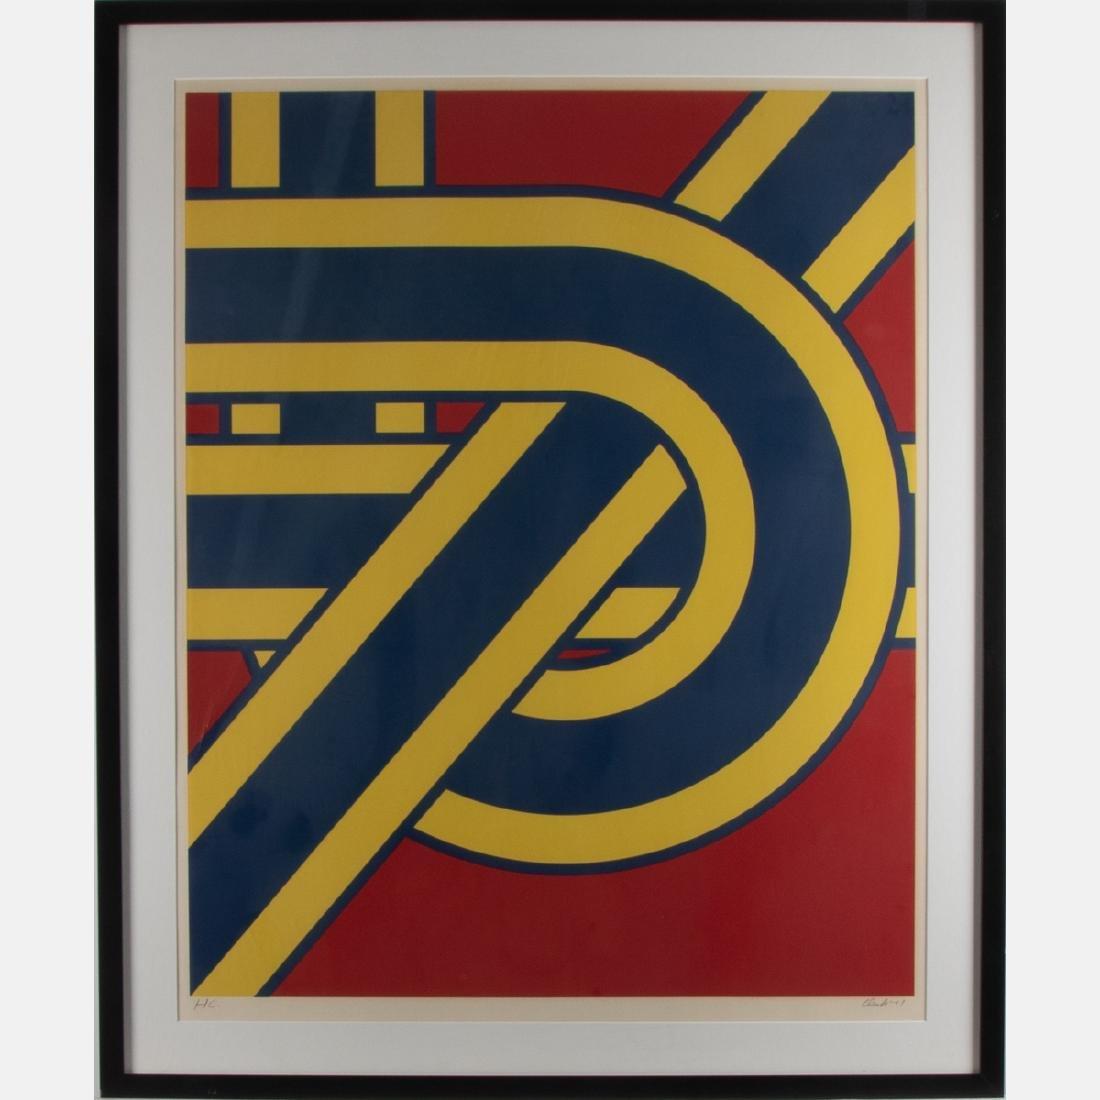 Pierre Clerk (b.1928) Untitled #3, 1971, Serigraph,